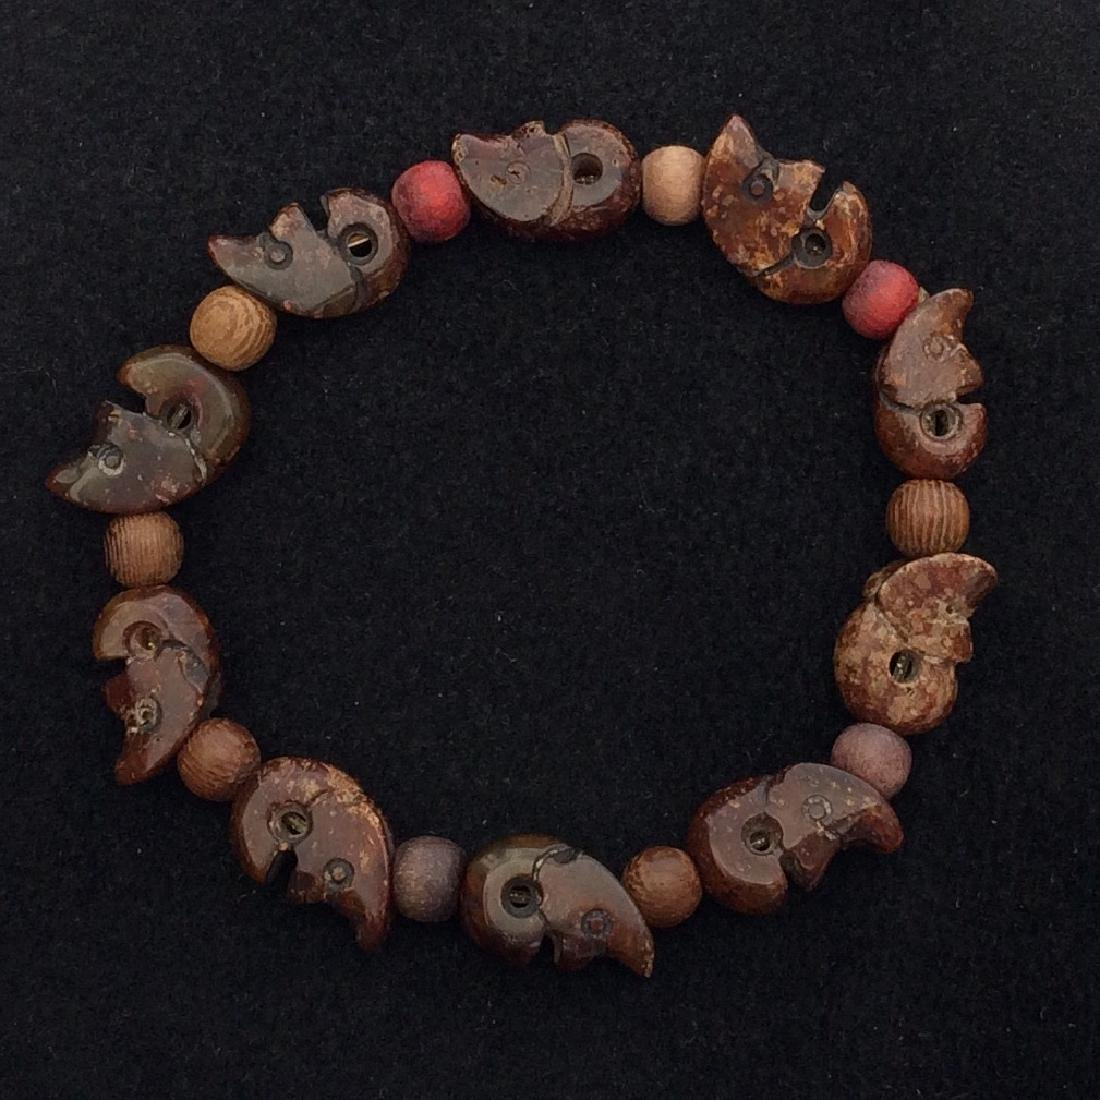 Chinese Old Style Jade Skull Bead Bracelet